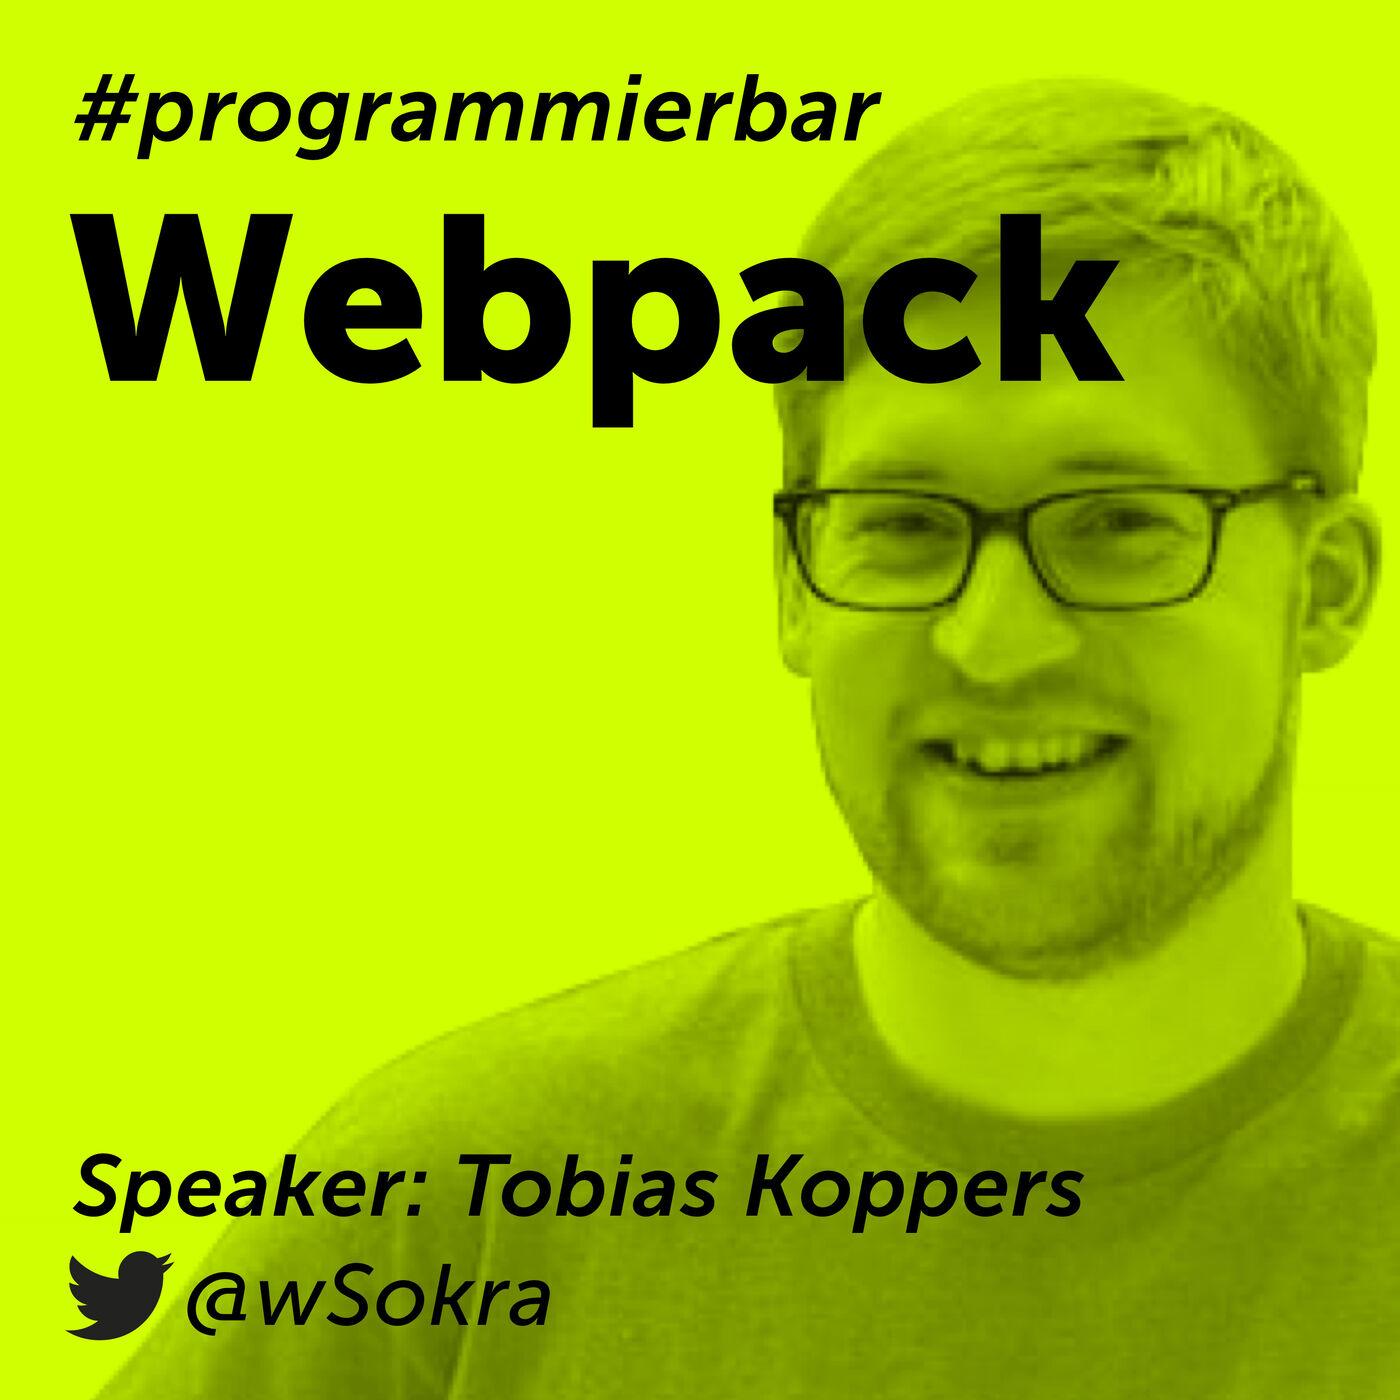 Folge 59 - Webpack mit dem Gründer Tobias Koppers